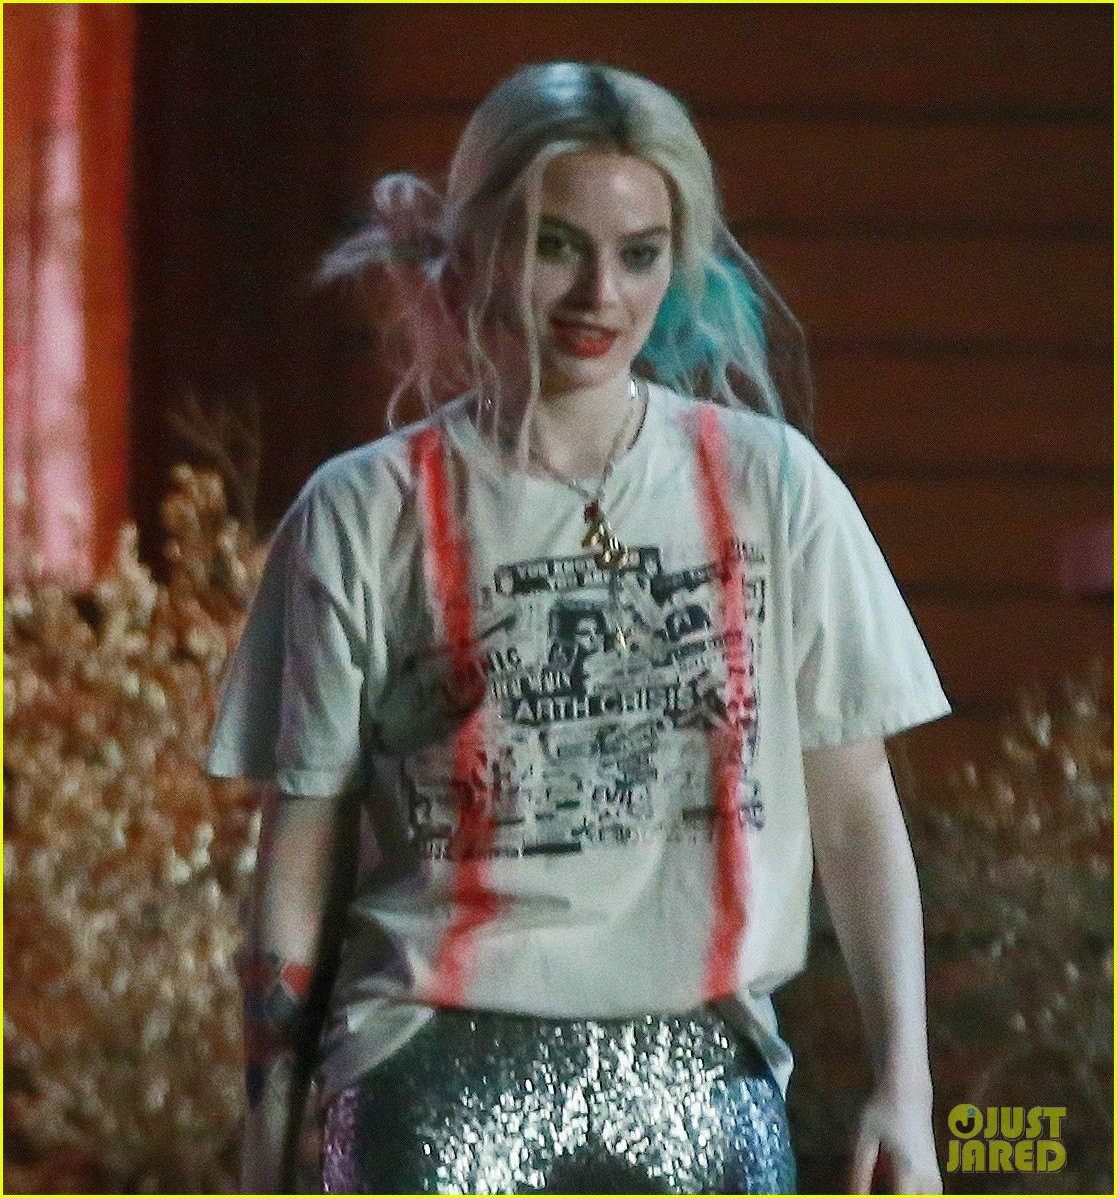 Margot Robbie Films Harley Quinn Joker Breakup Scene For Birds Of Prey Movie Photo 4264944 Birds Of Prey Margot Robbie Pictures Just Jared